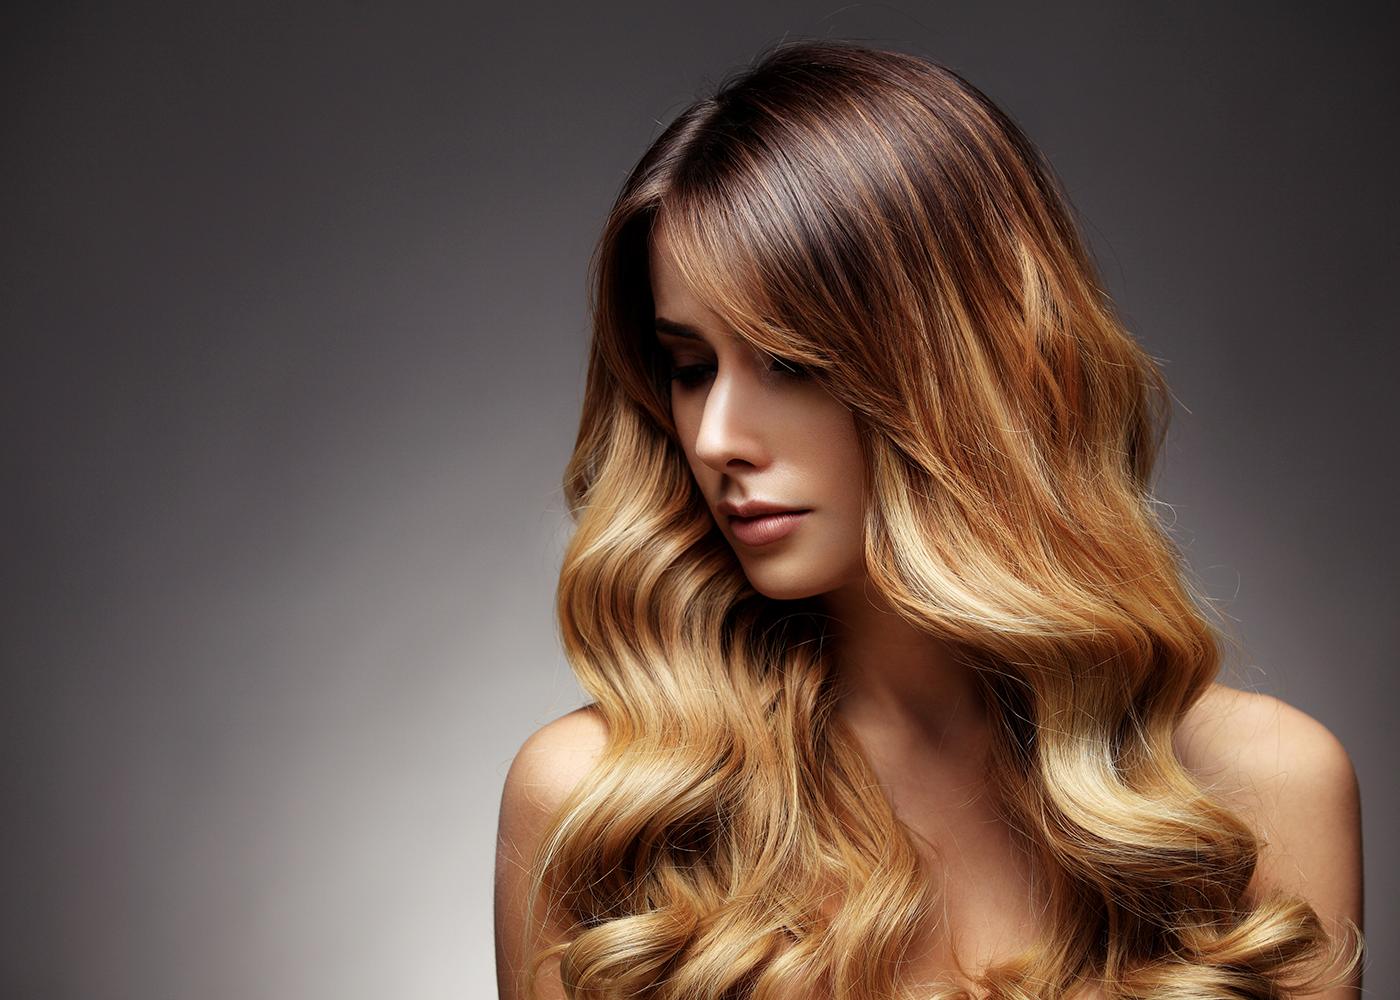 Фото или картинки по окрашиванию волос